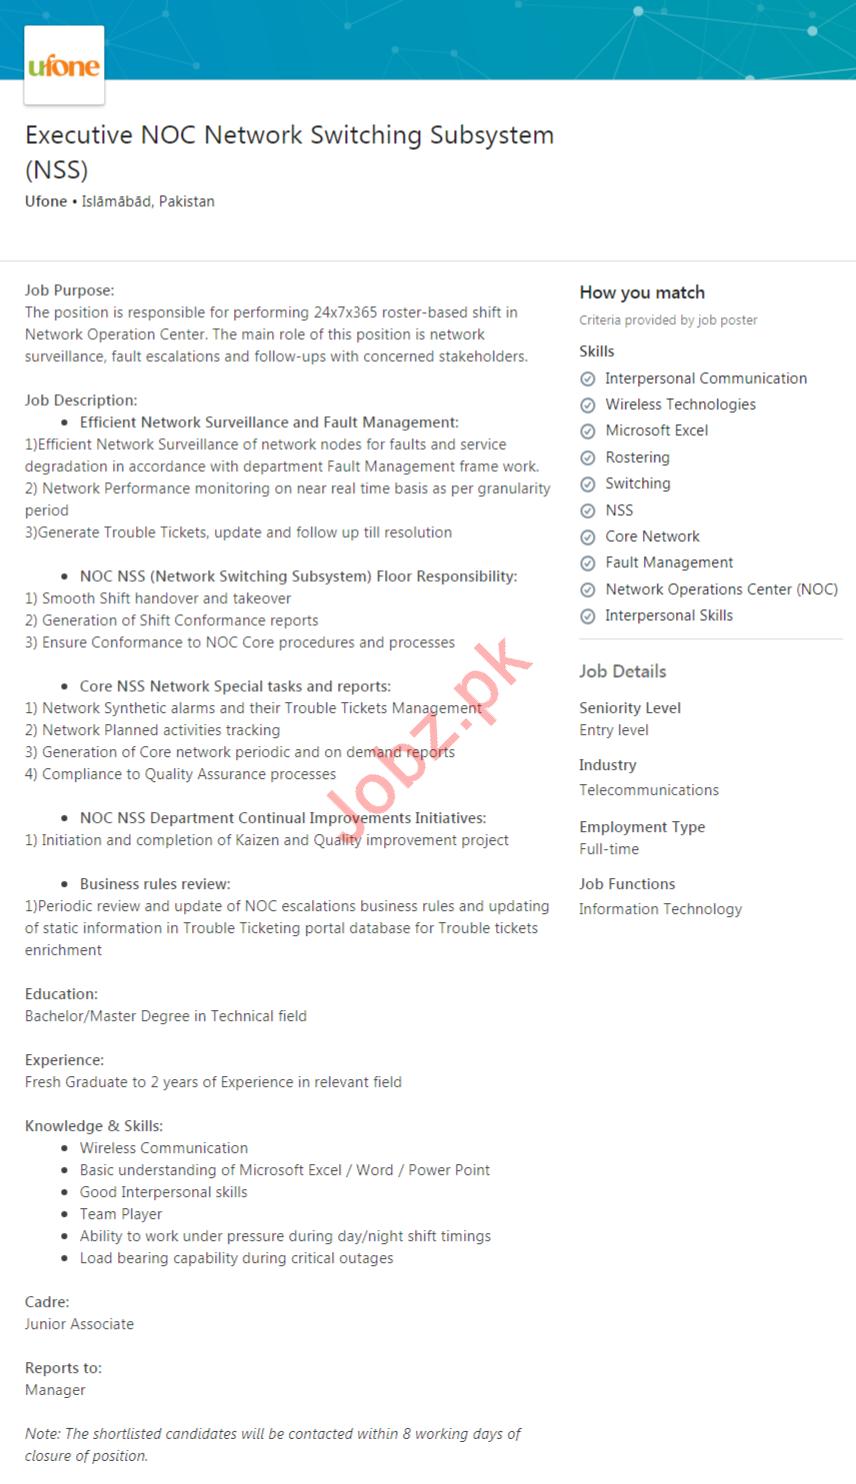 Executive NOC Network Switching Subsystem Job 2020